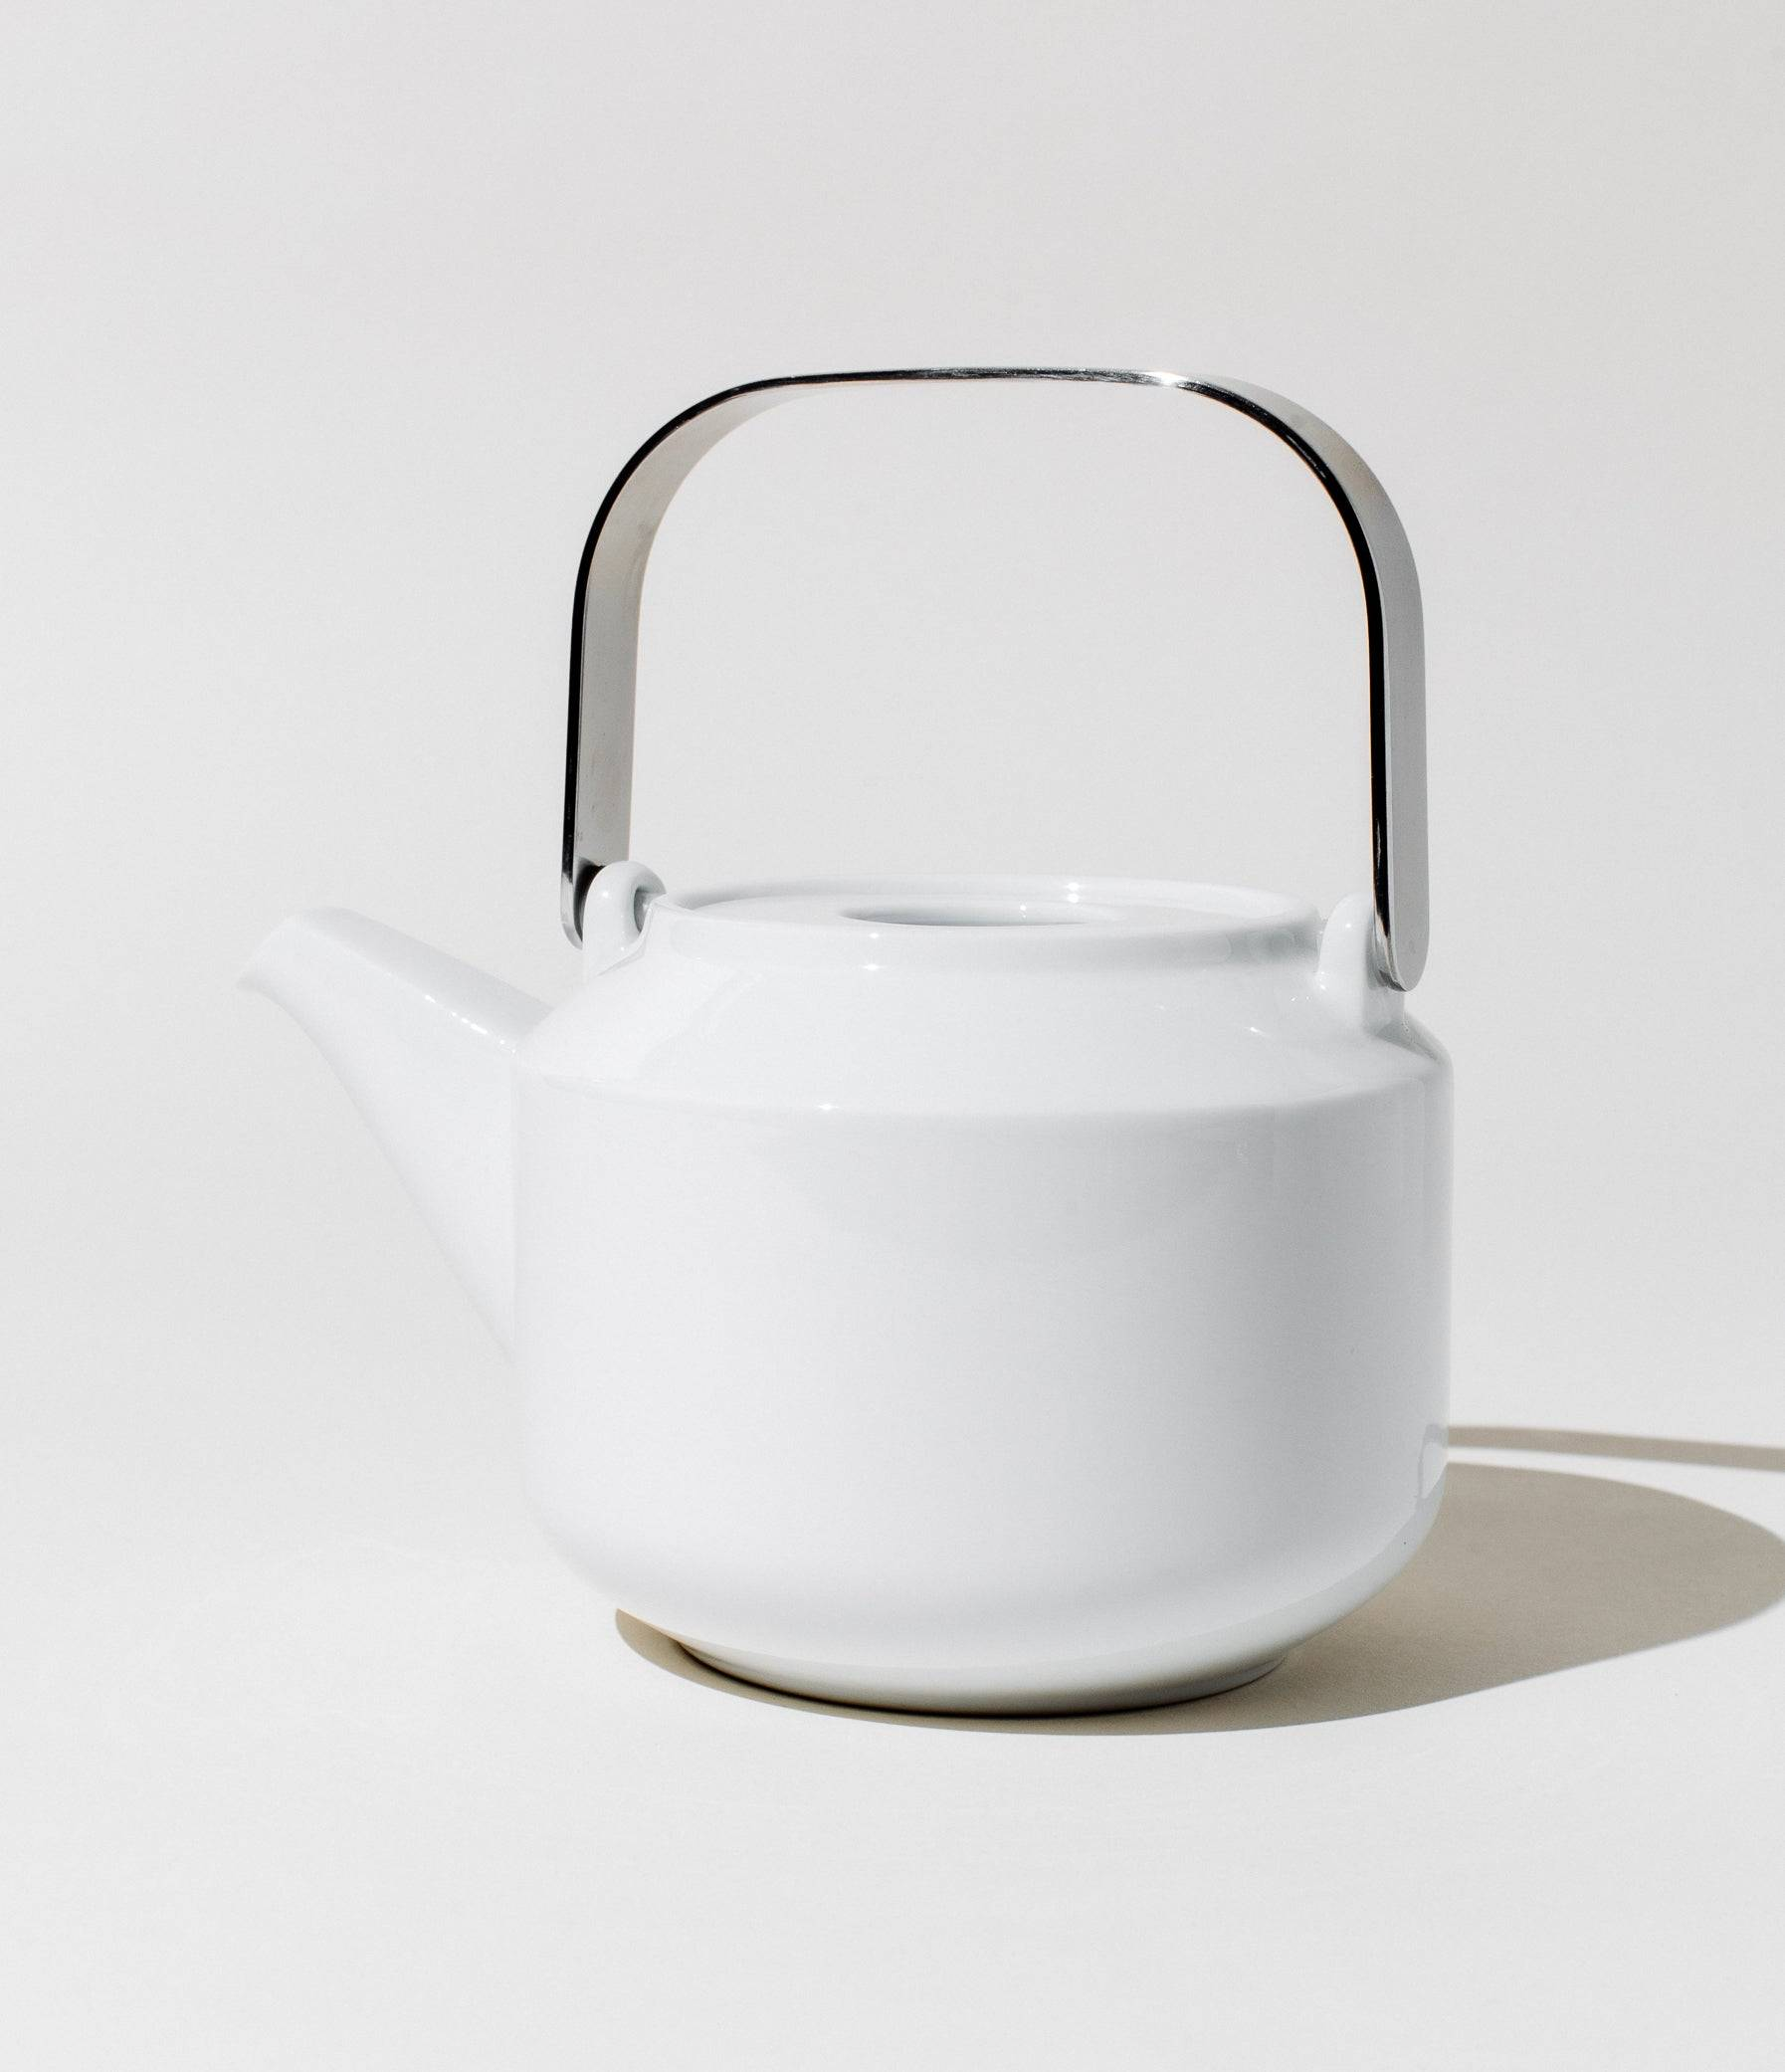 Kinto Porcelain Leaves-To-Tea Teapot Teaware WHITE by Art of Tea